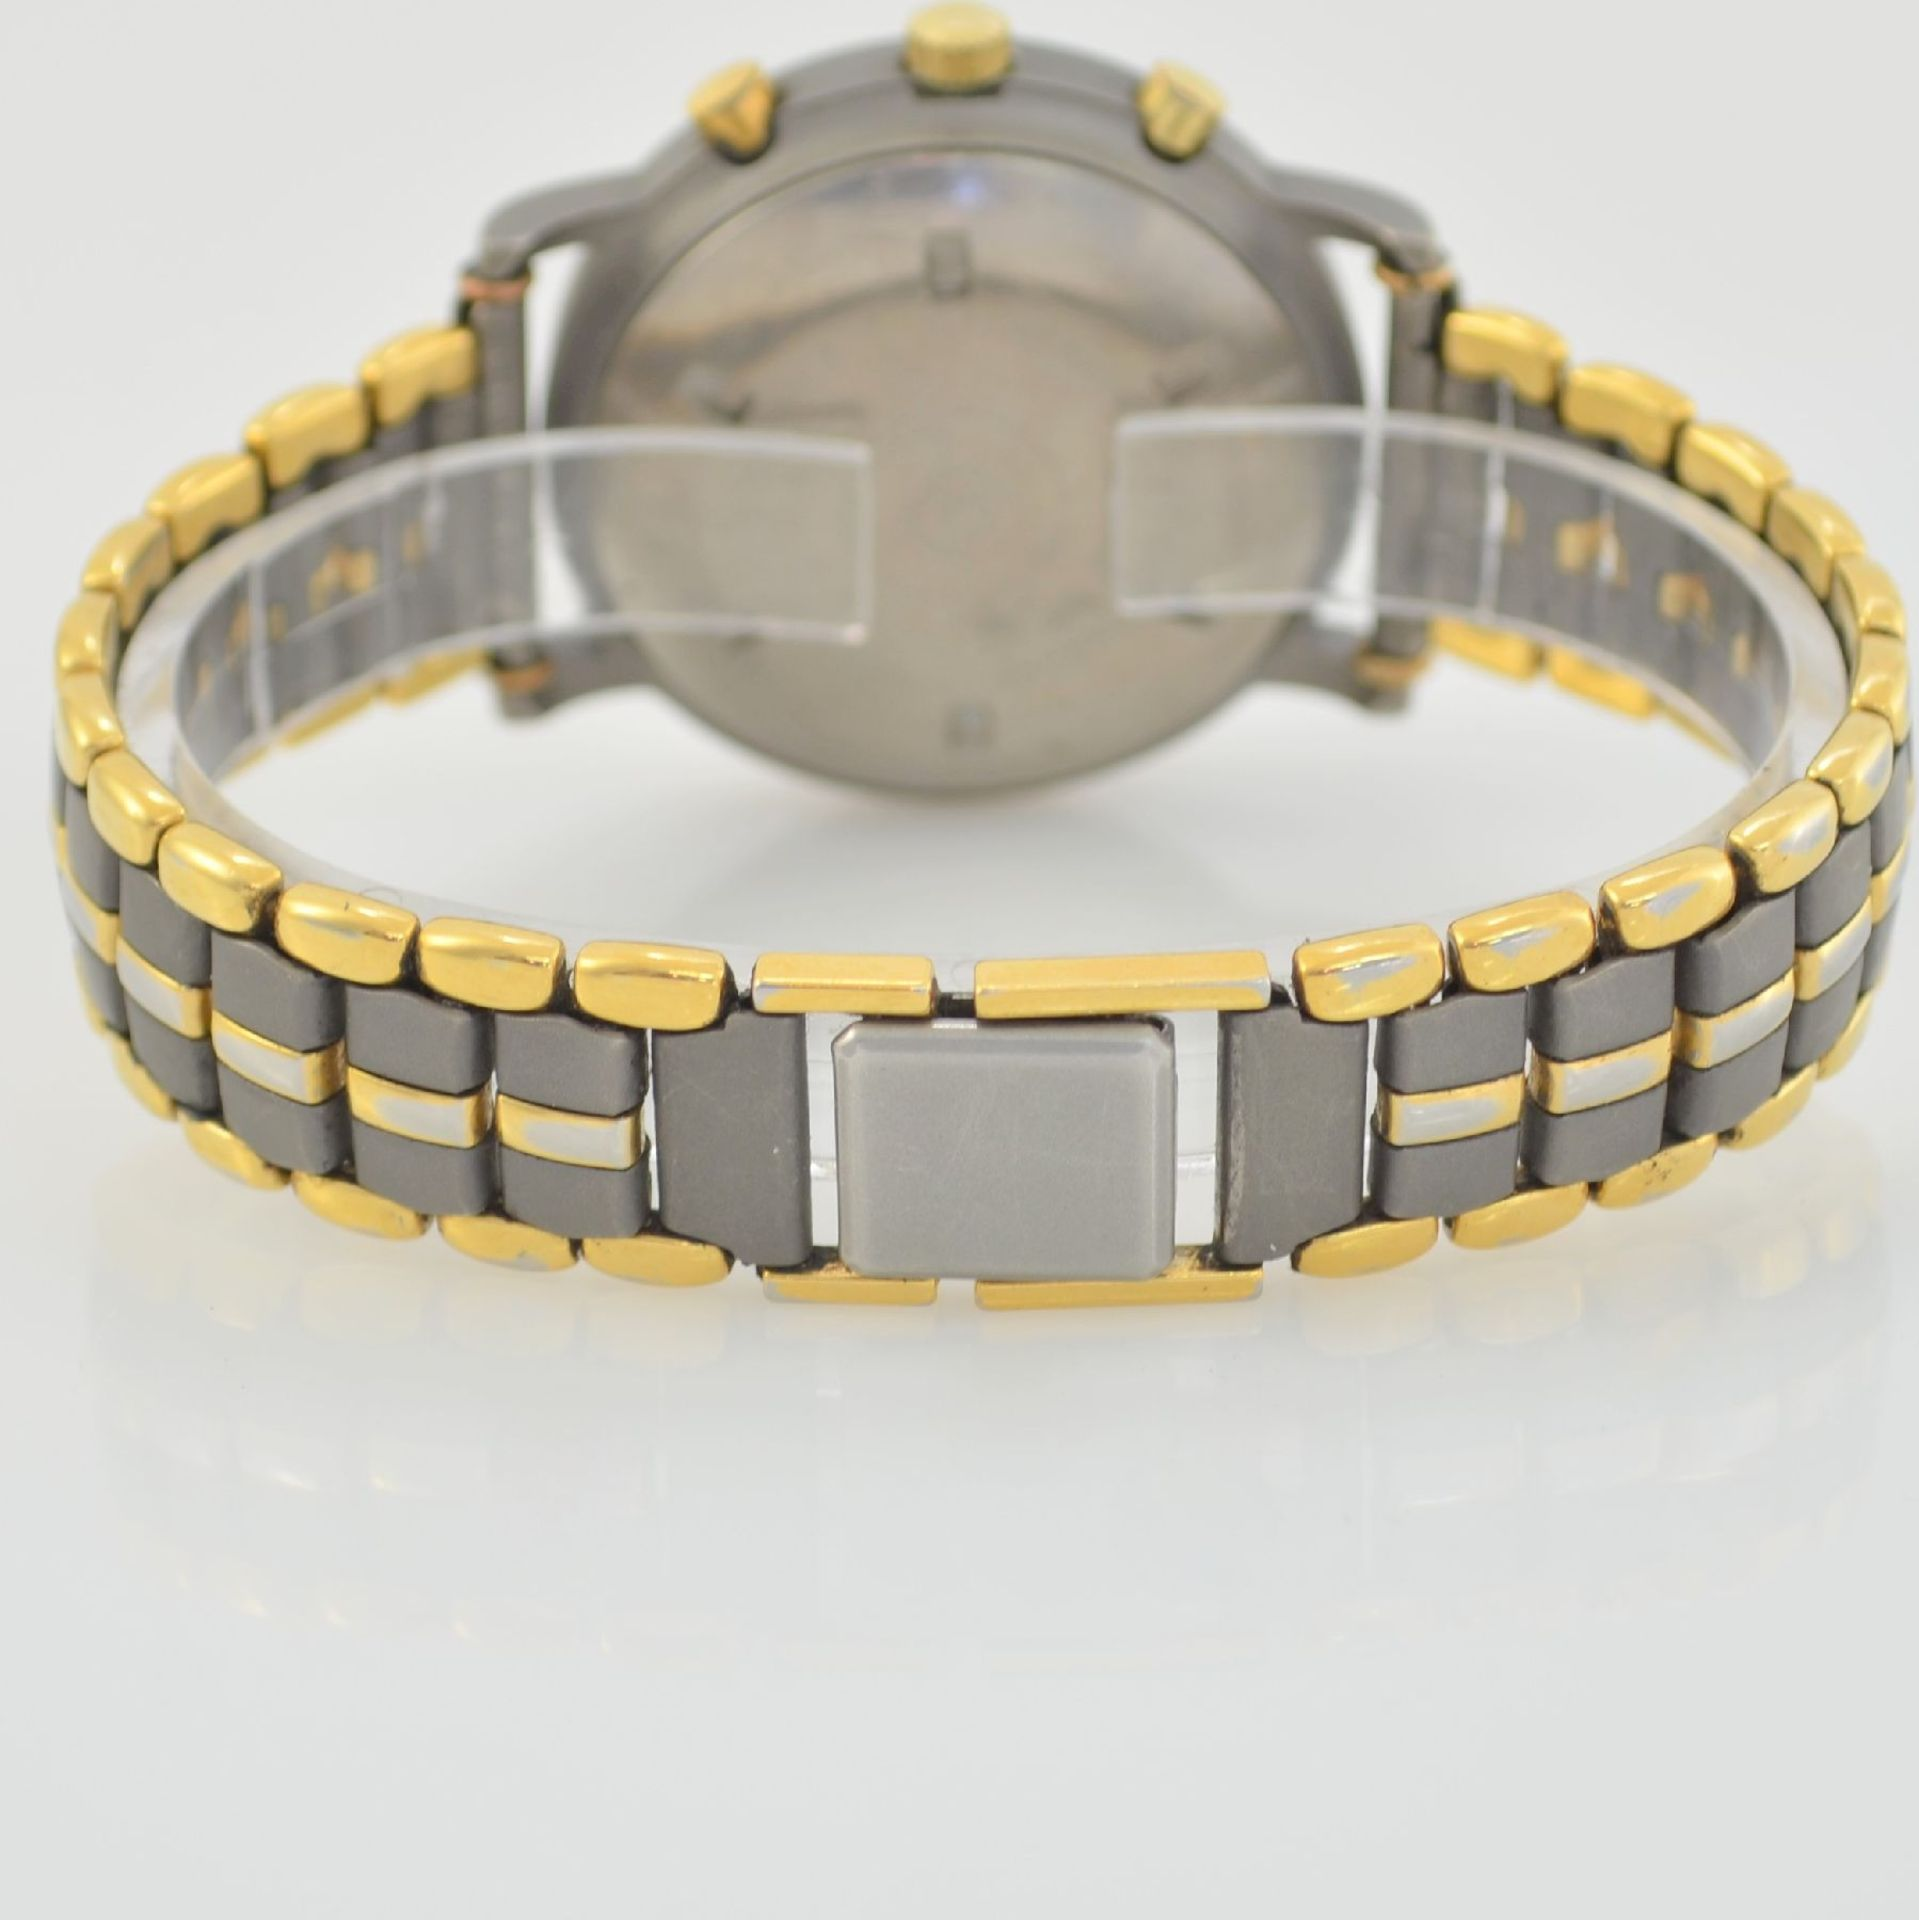 ZENTRA Herrenarmbanduhr Armbandchronograph, Automatik, Schweiz um 1987, Titangeh. inkl. - Bild 5 aus 6